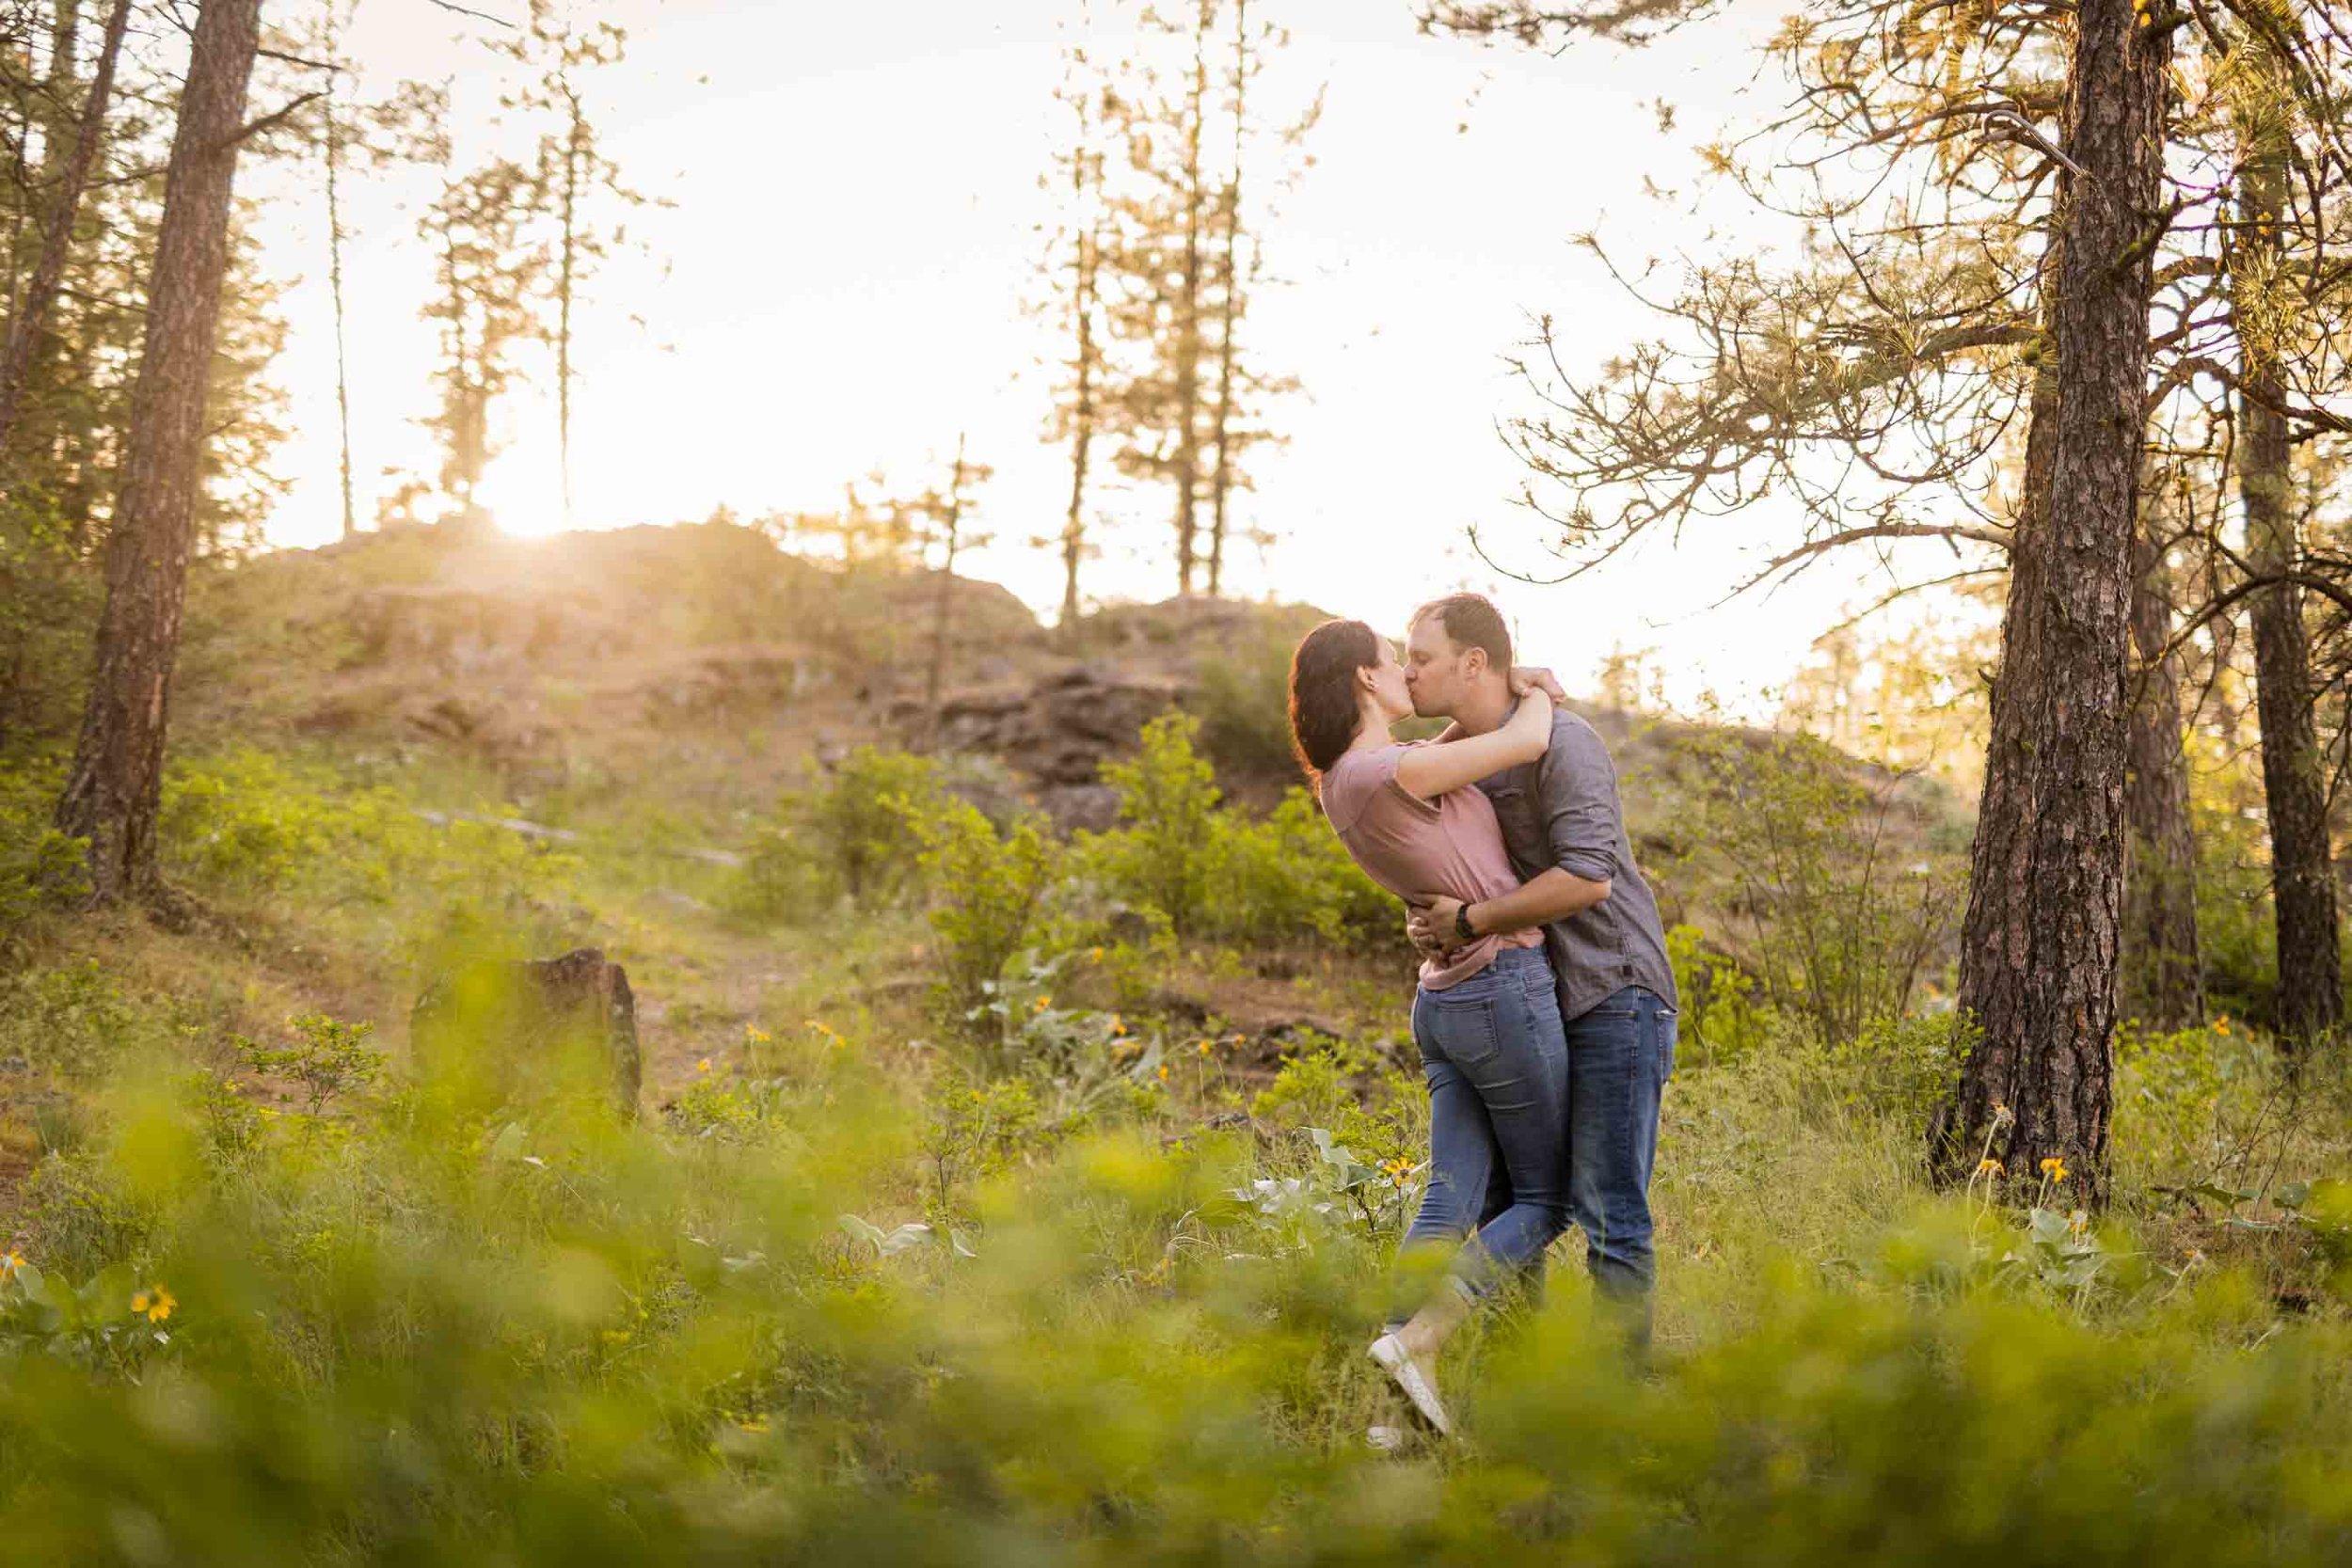 Engagement Photography in Spokane, WA